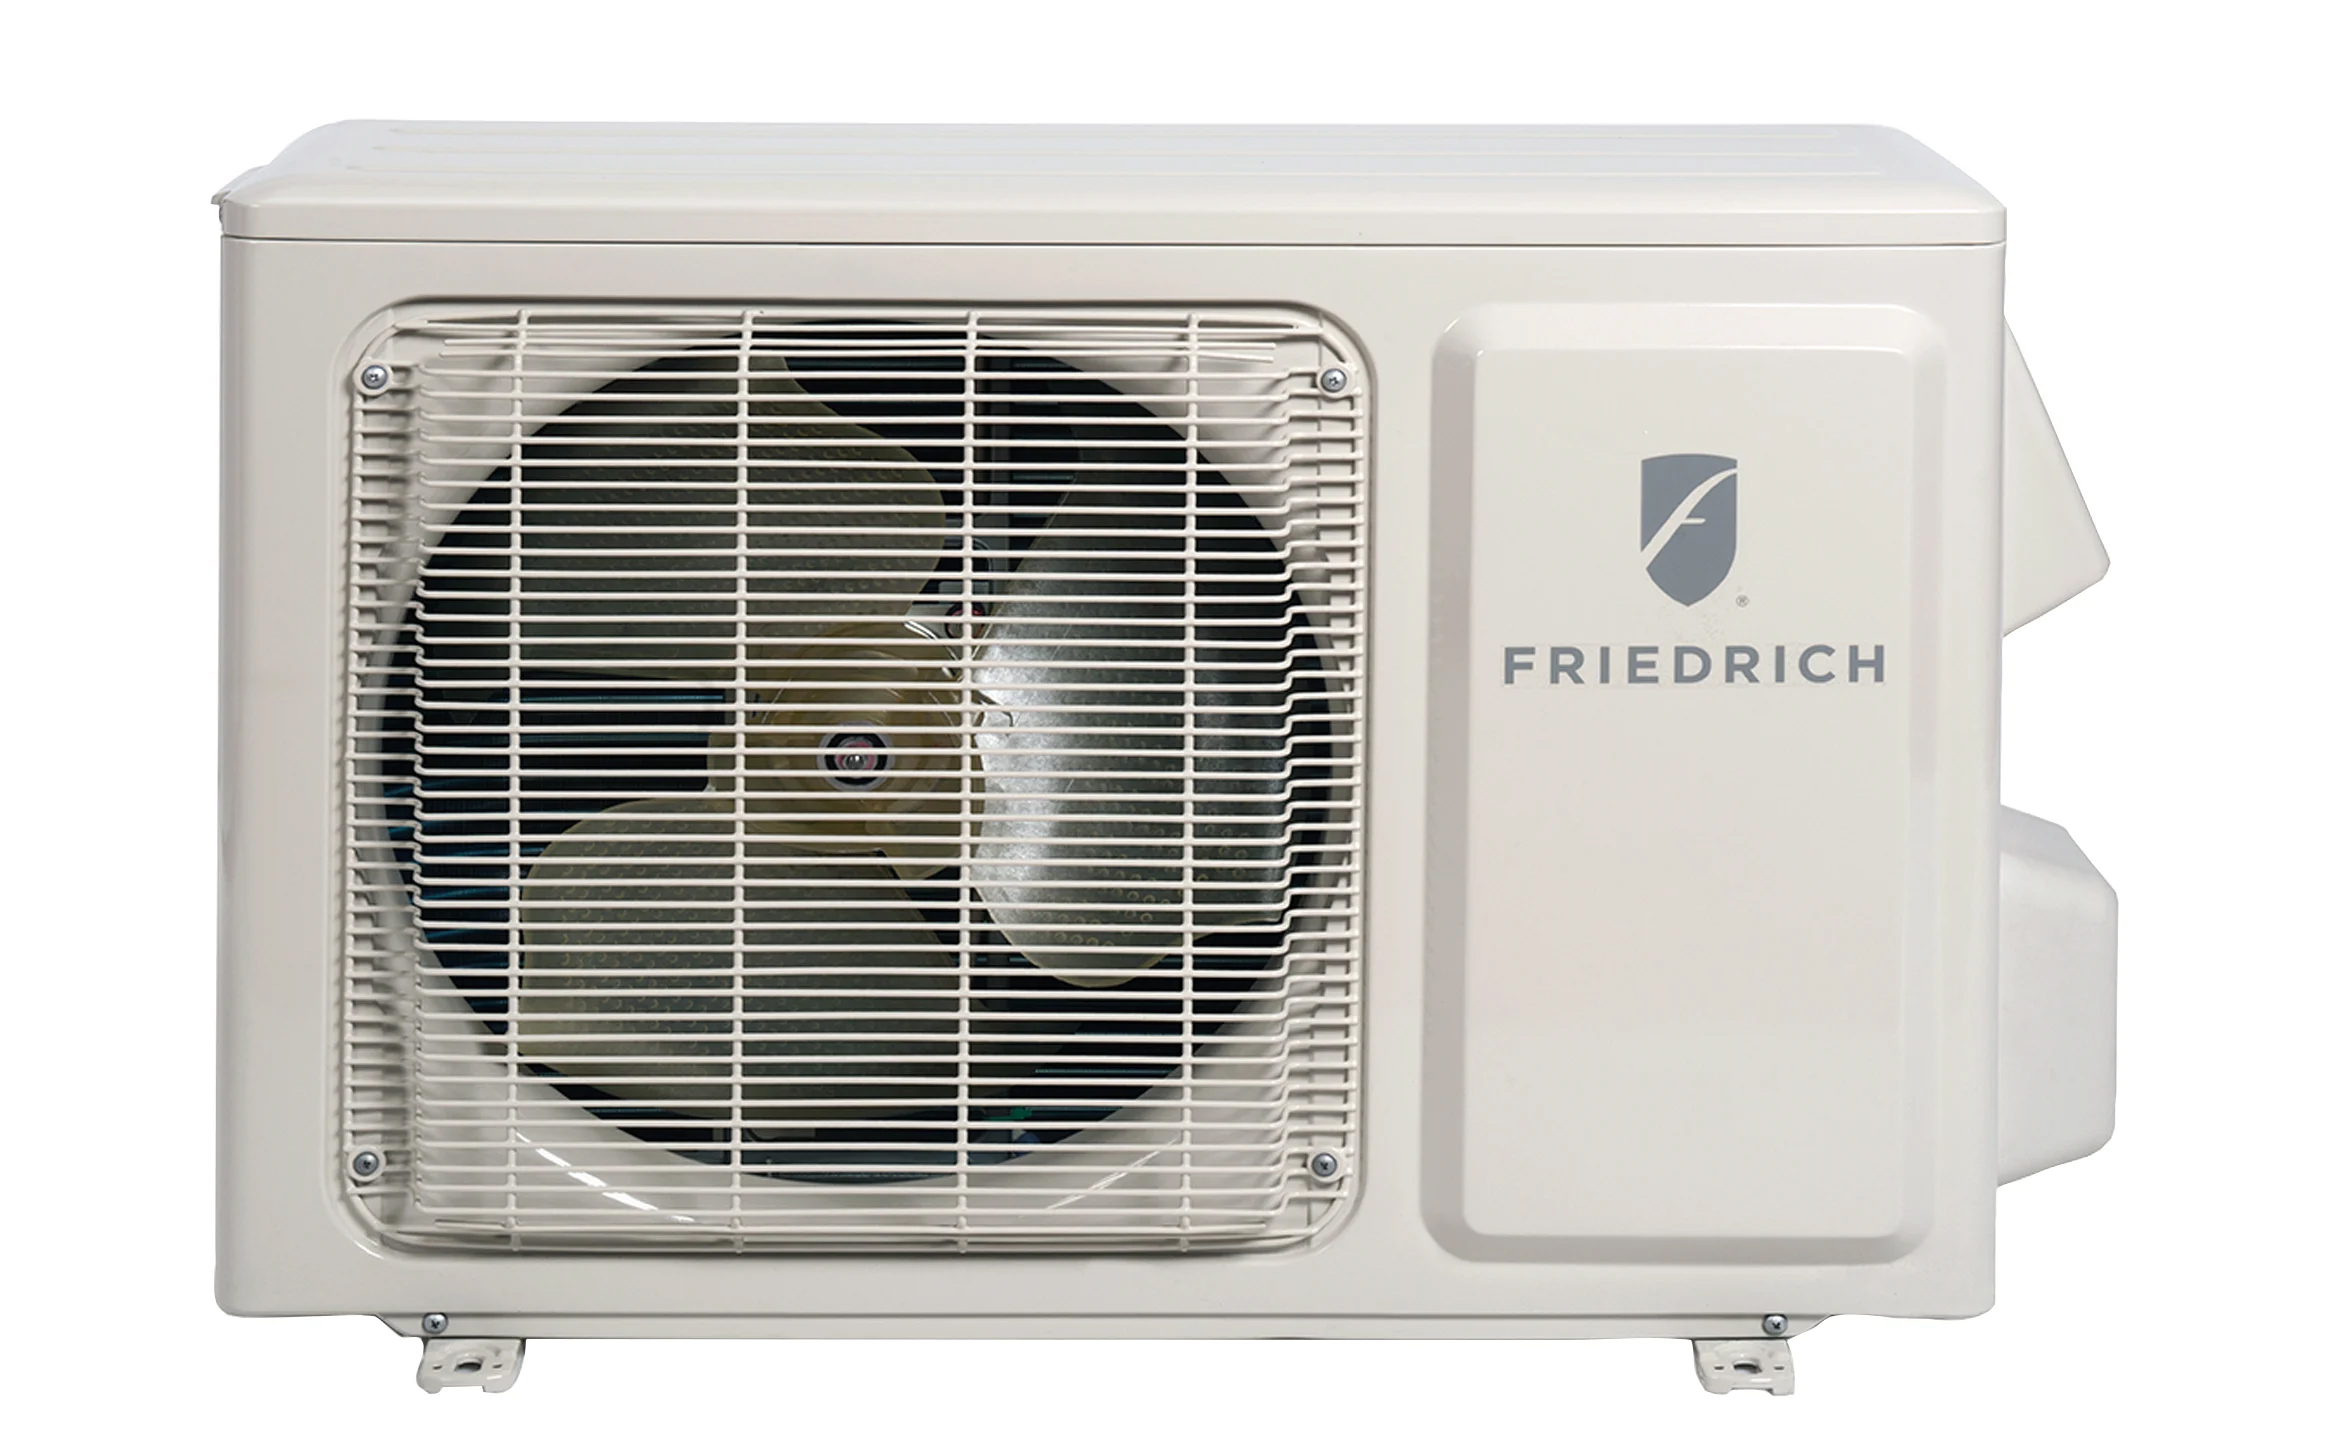 Friedrich FSHSR09A1A 9000 BTU Floating Air Select Series Outdoor Unit